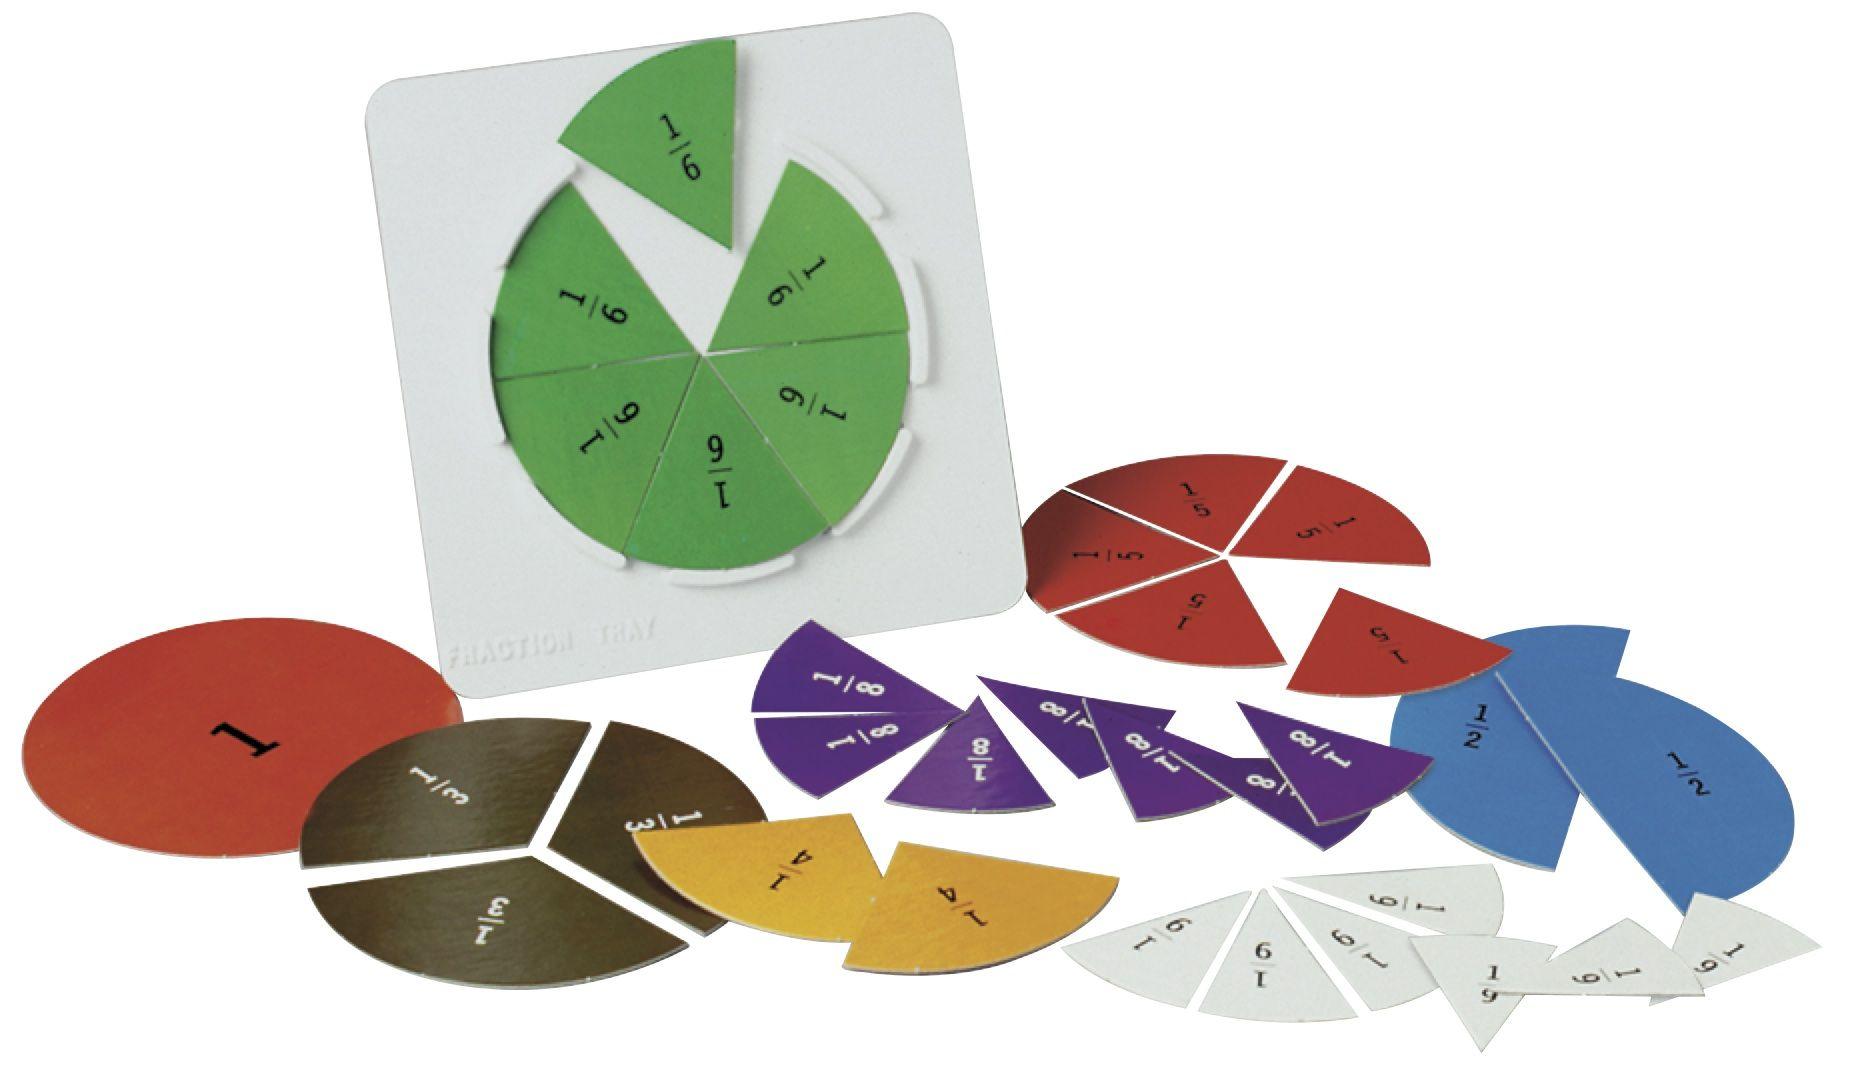 Fraction discs fractions math manipulatives manipulatives